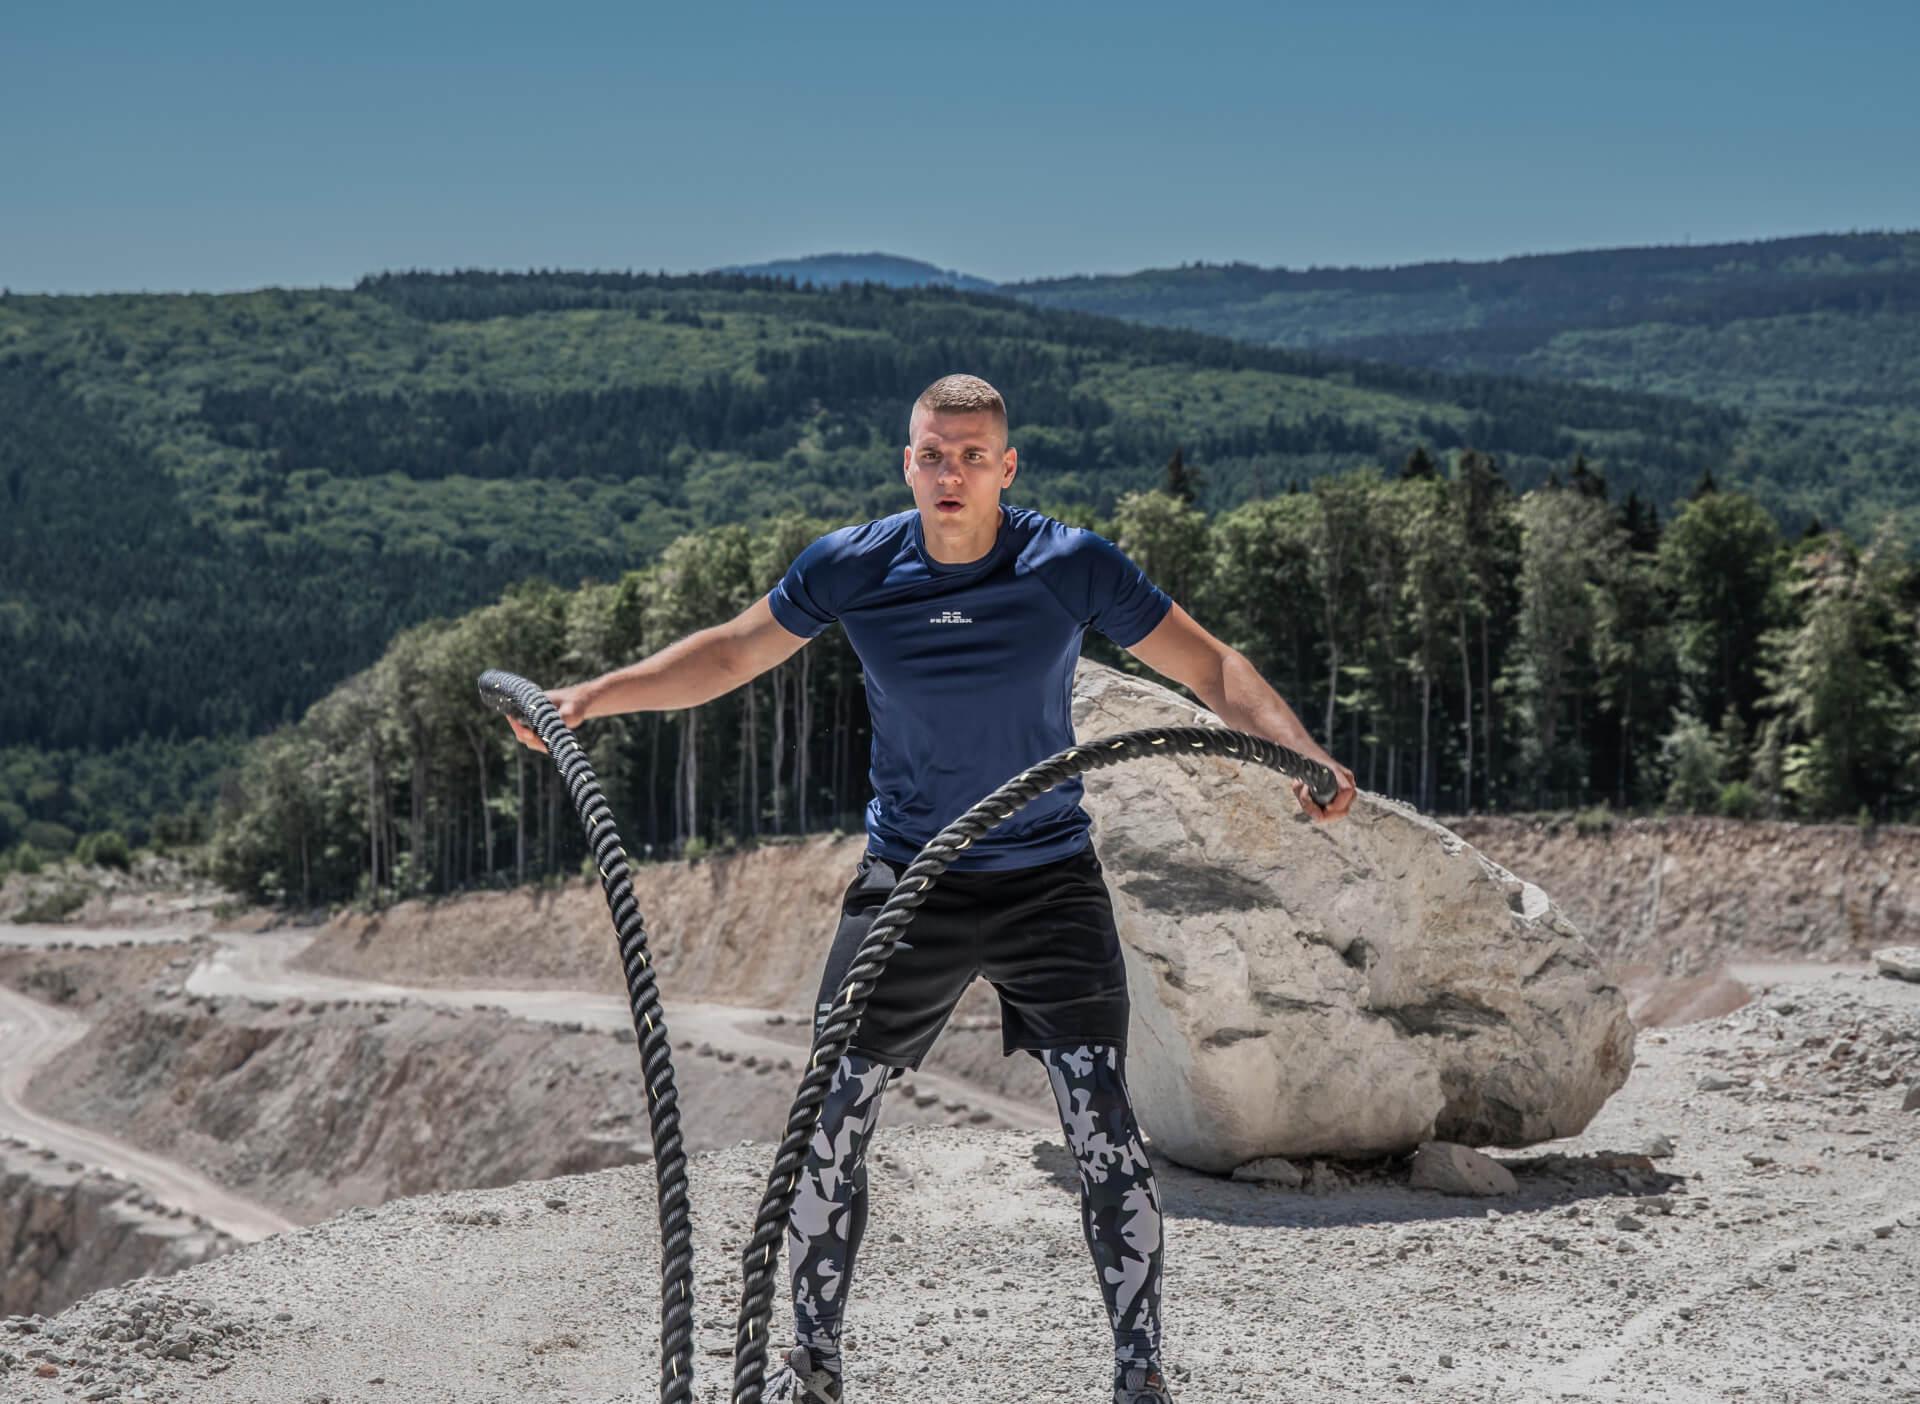 FEFLOGX Sportswear Funktionsshirt Pure und Leggings Camouflage, Battle Rope Workout (1).